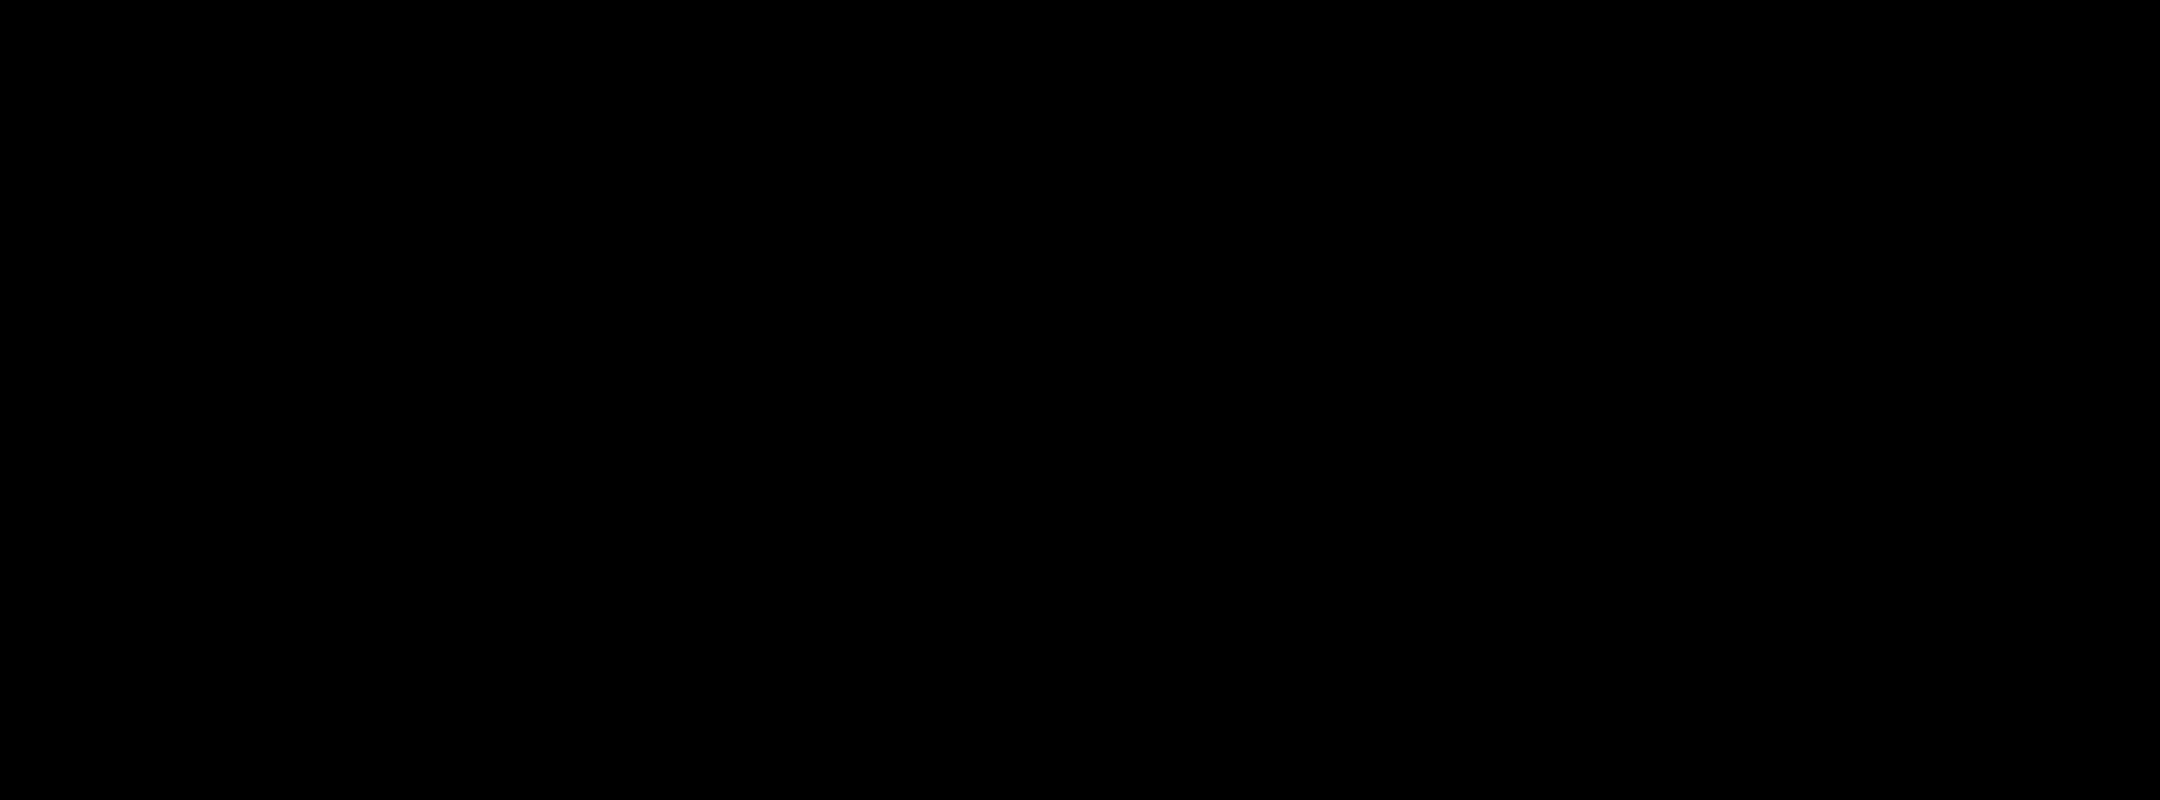 tribetactics-logo